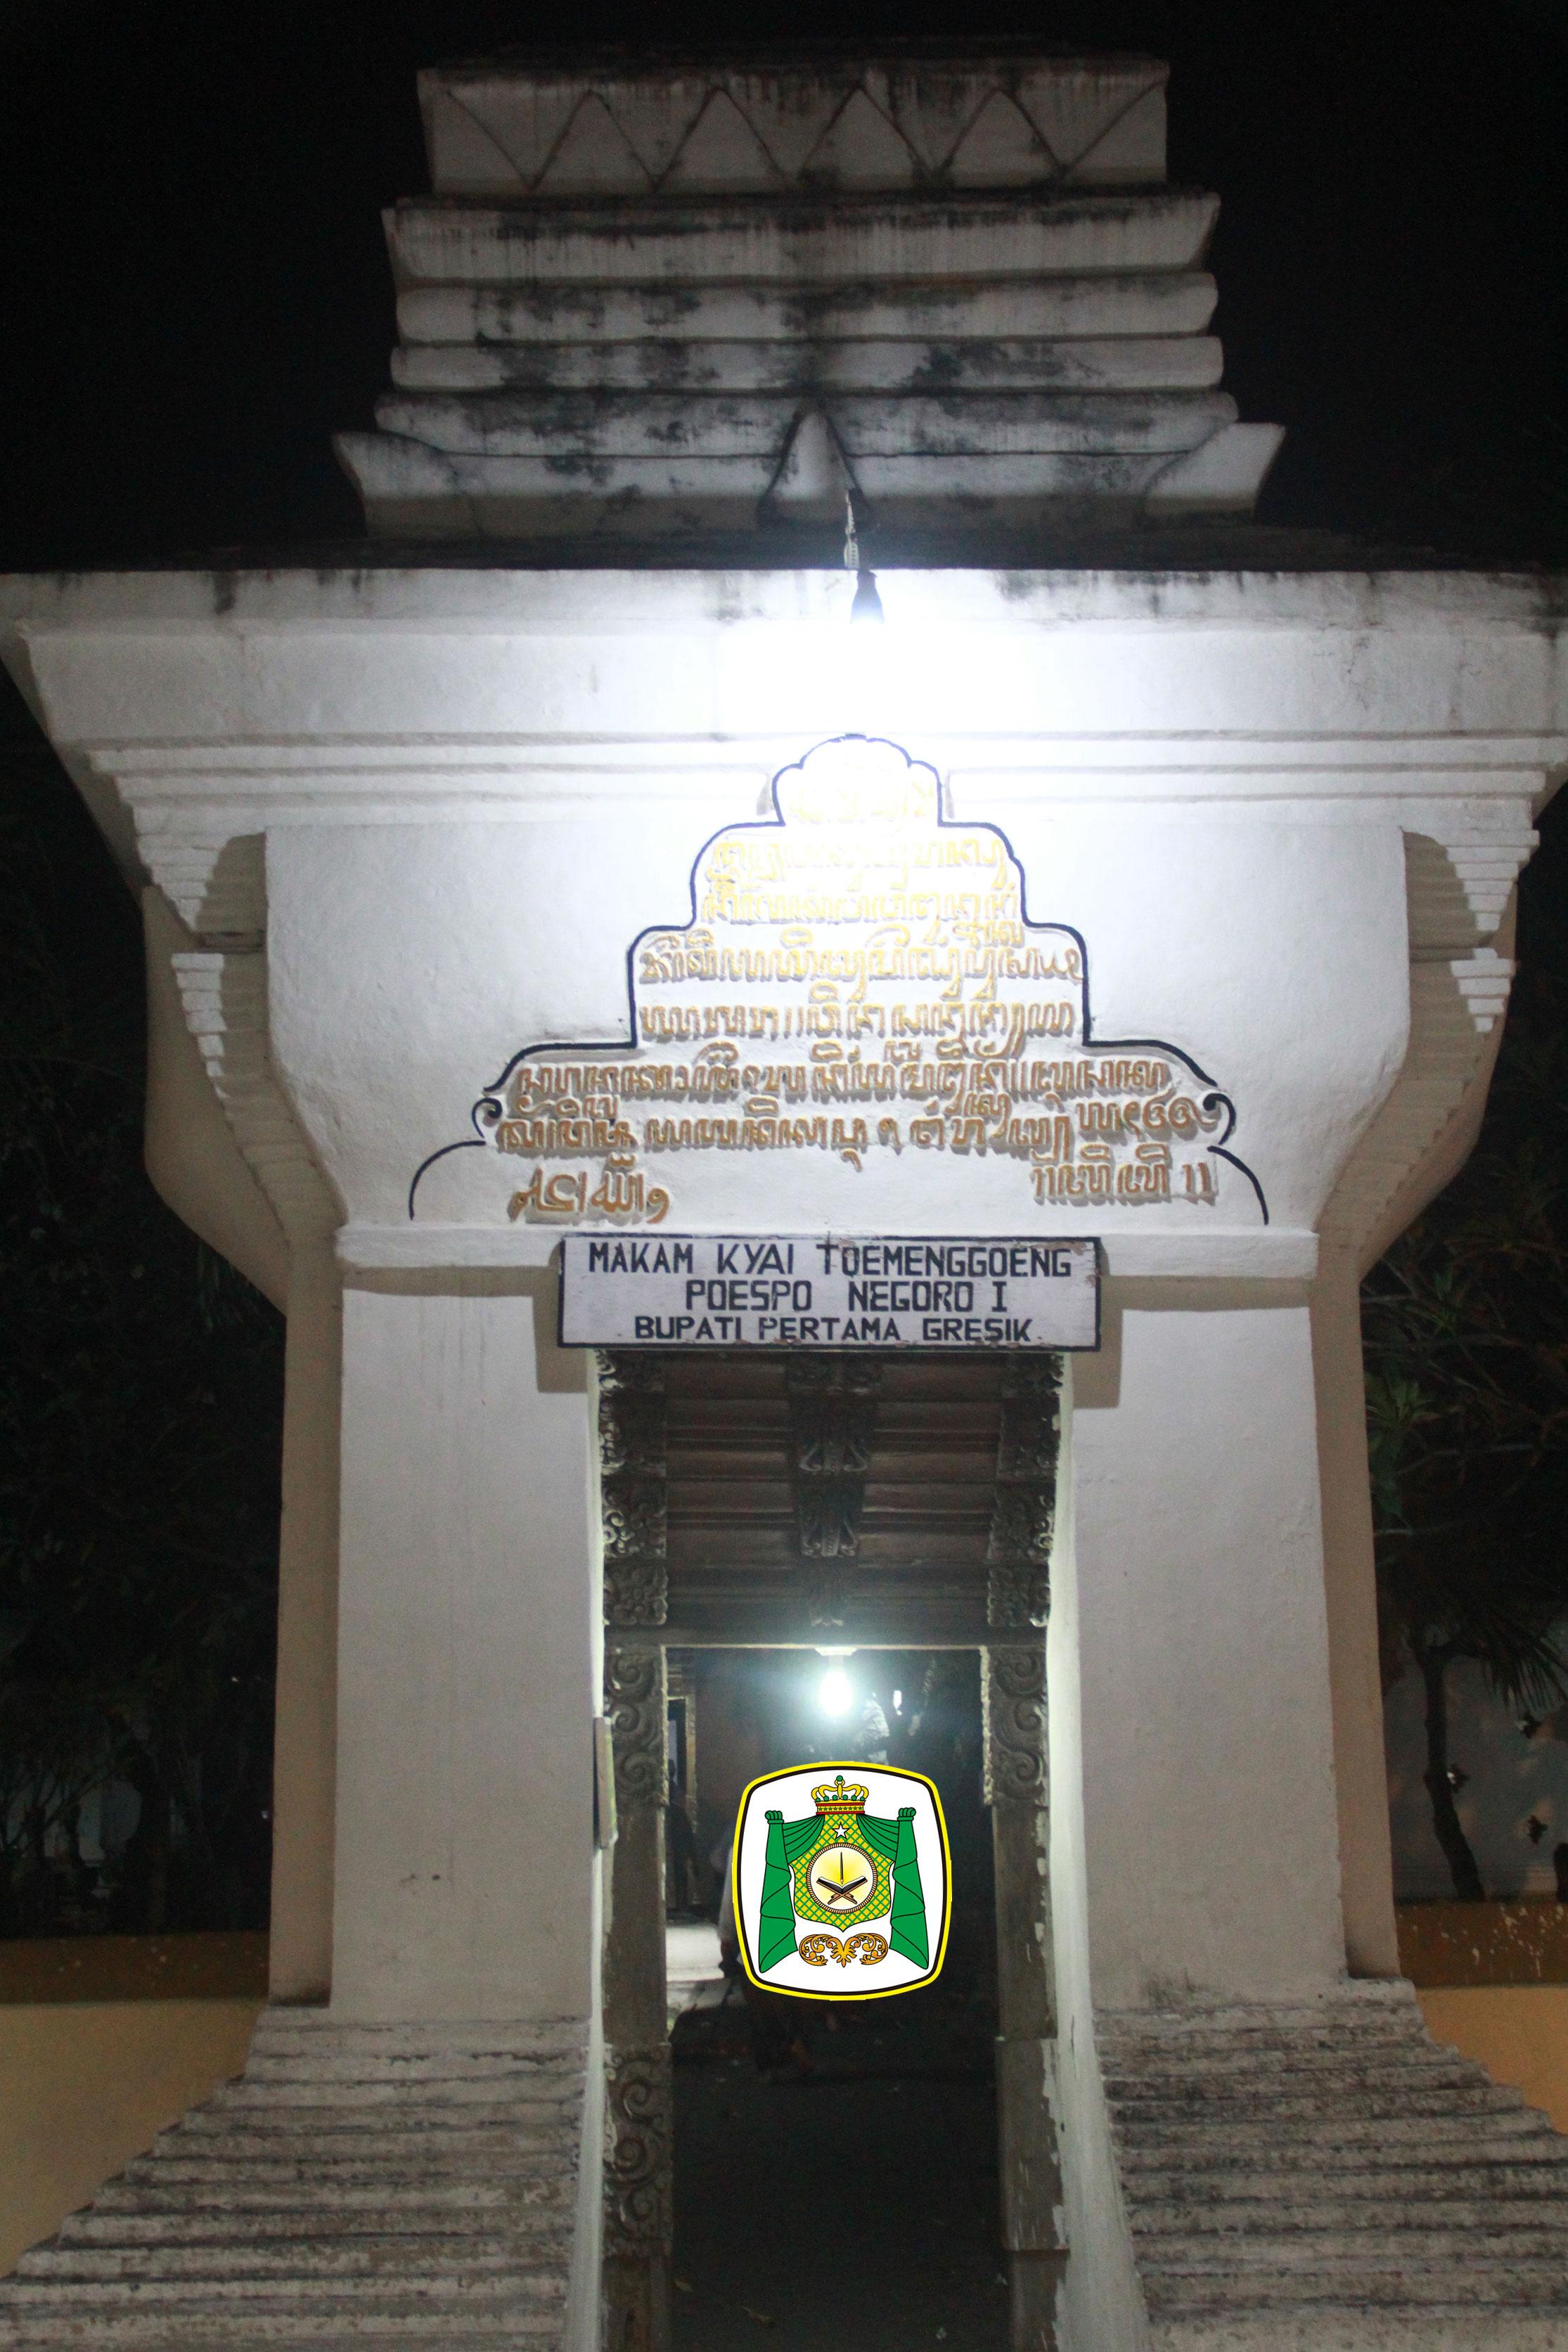 Raden Kyai Tumenggung Poesponegoro Almunawwarah Trans Gapura Paduraksa Bagian Depan